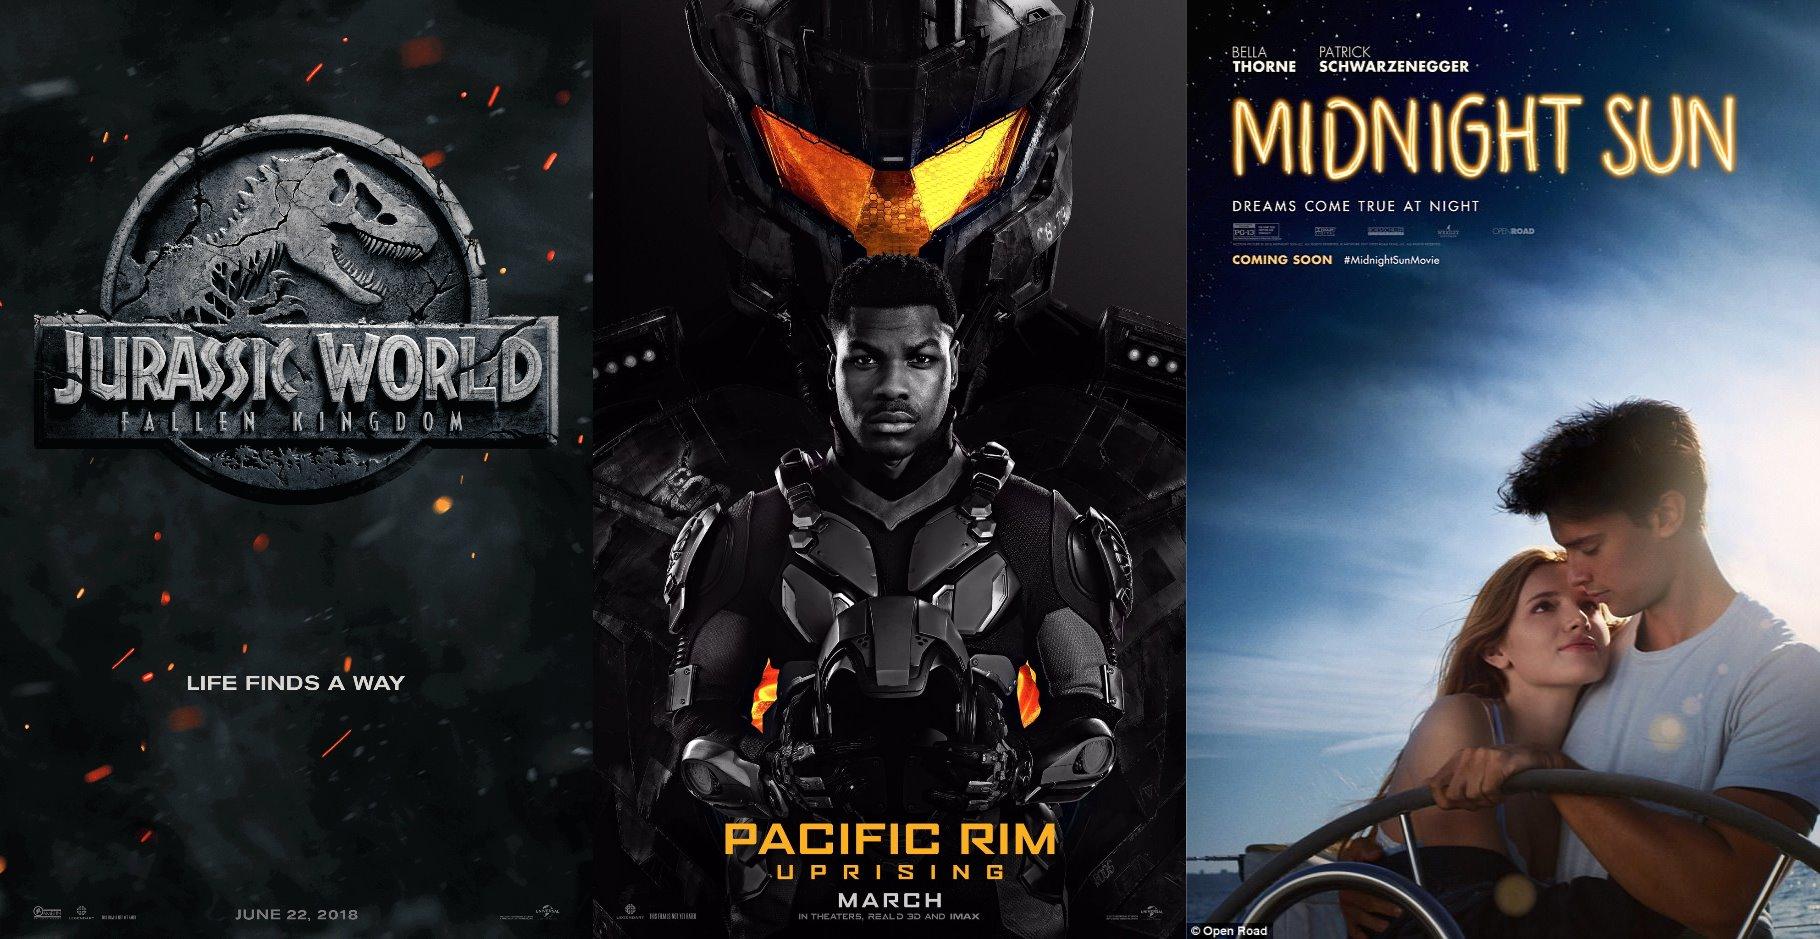 Trailer-Watchin' Wednesday: Pacific Rim: Uprising, Midnight Sun, Jurassic World: Fallen Kingdom